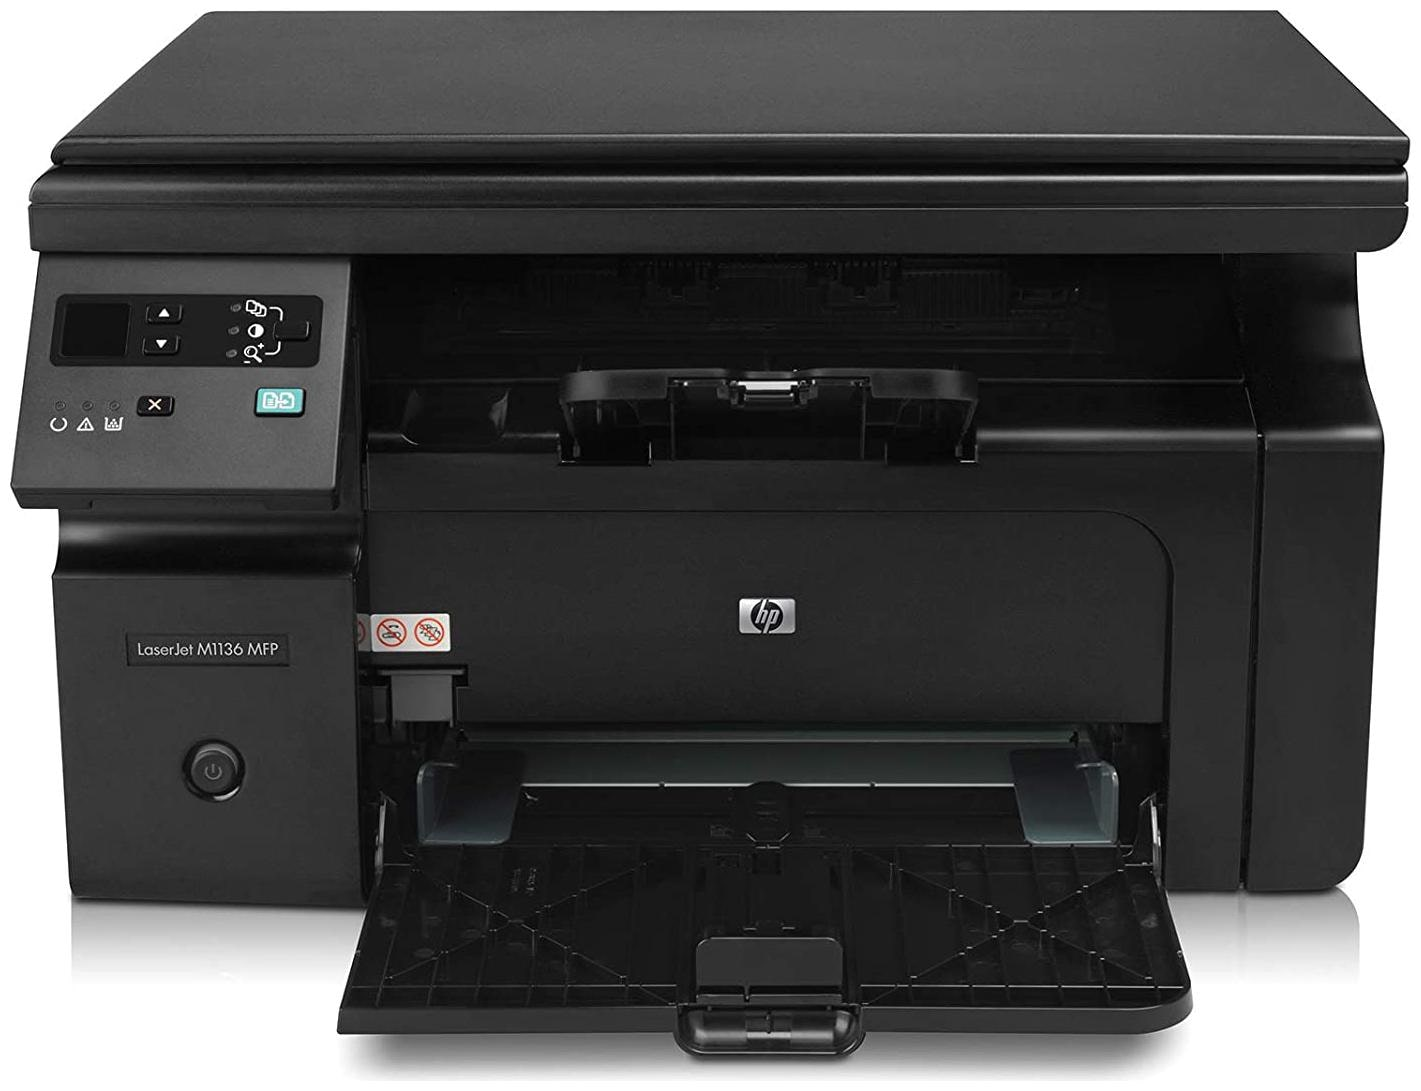 HP M1136 Multi Function Laser Printer by Computronics Multi